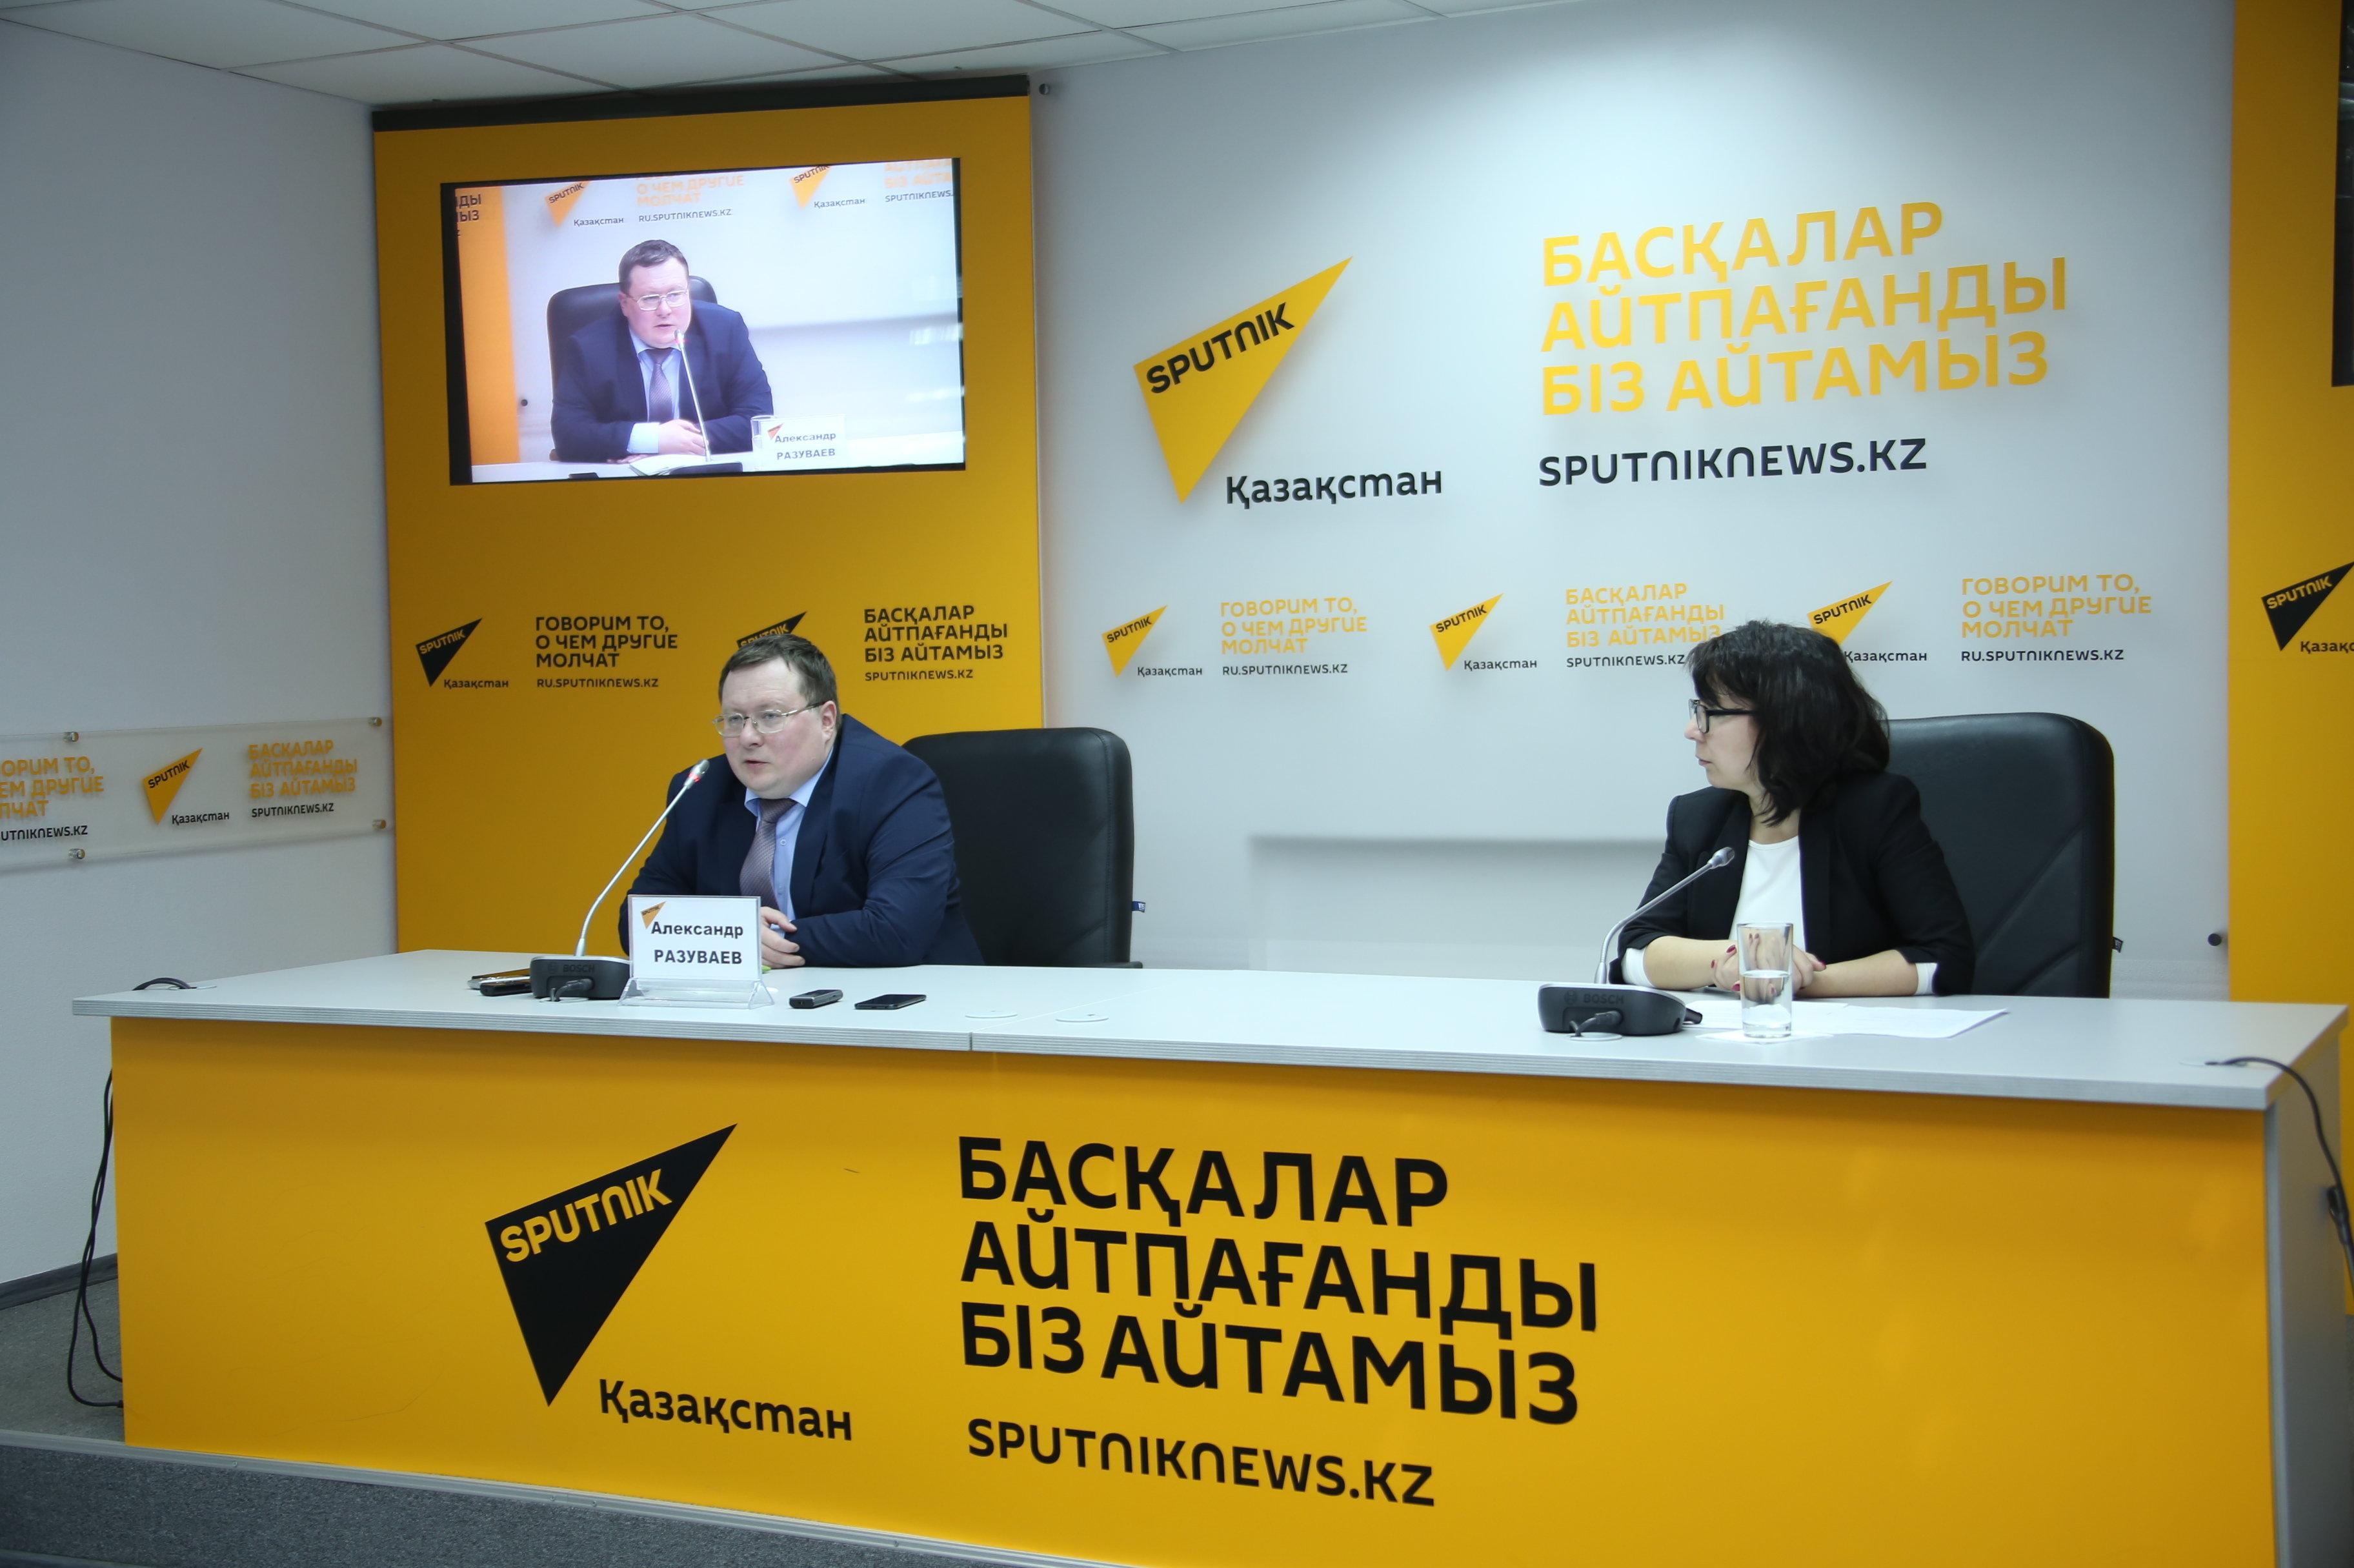 Директор аналитического департамента компании Альпари Александр Разуваев